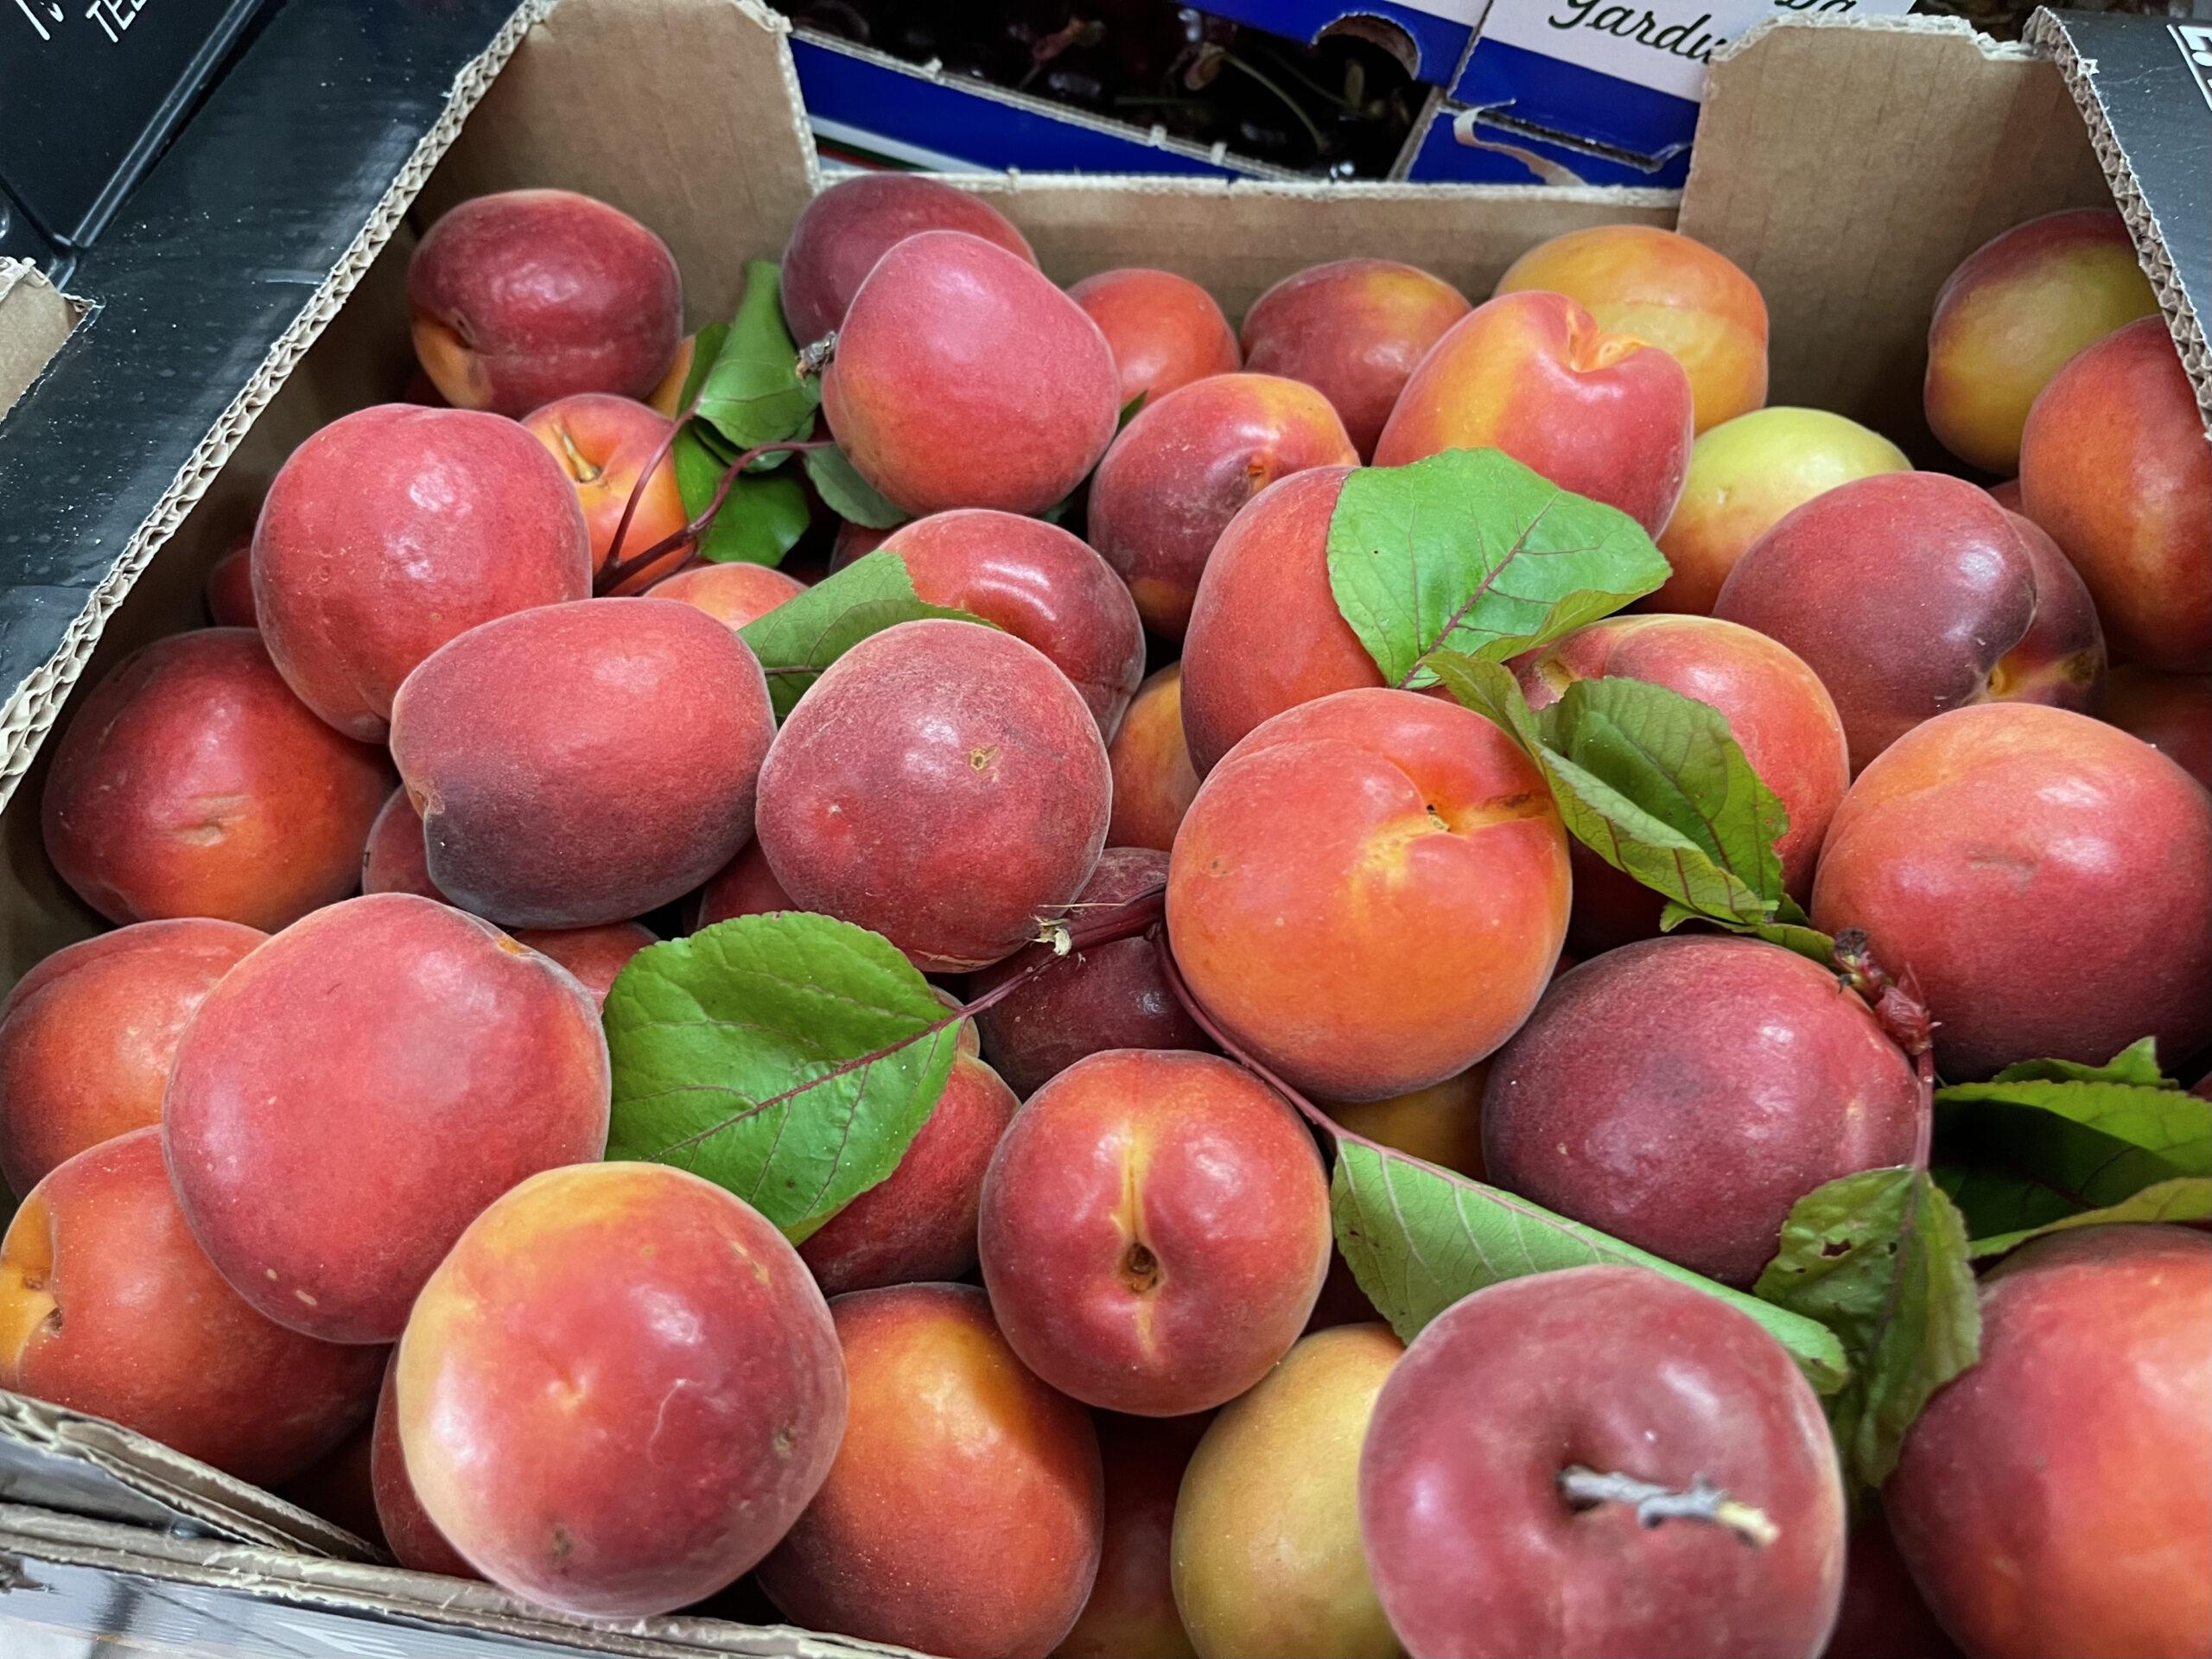 Deliciously ripe apricots in Portugal